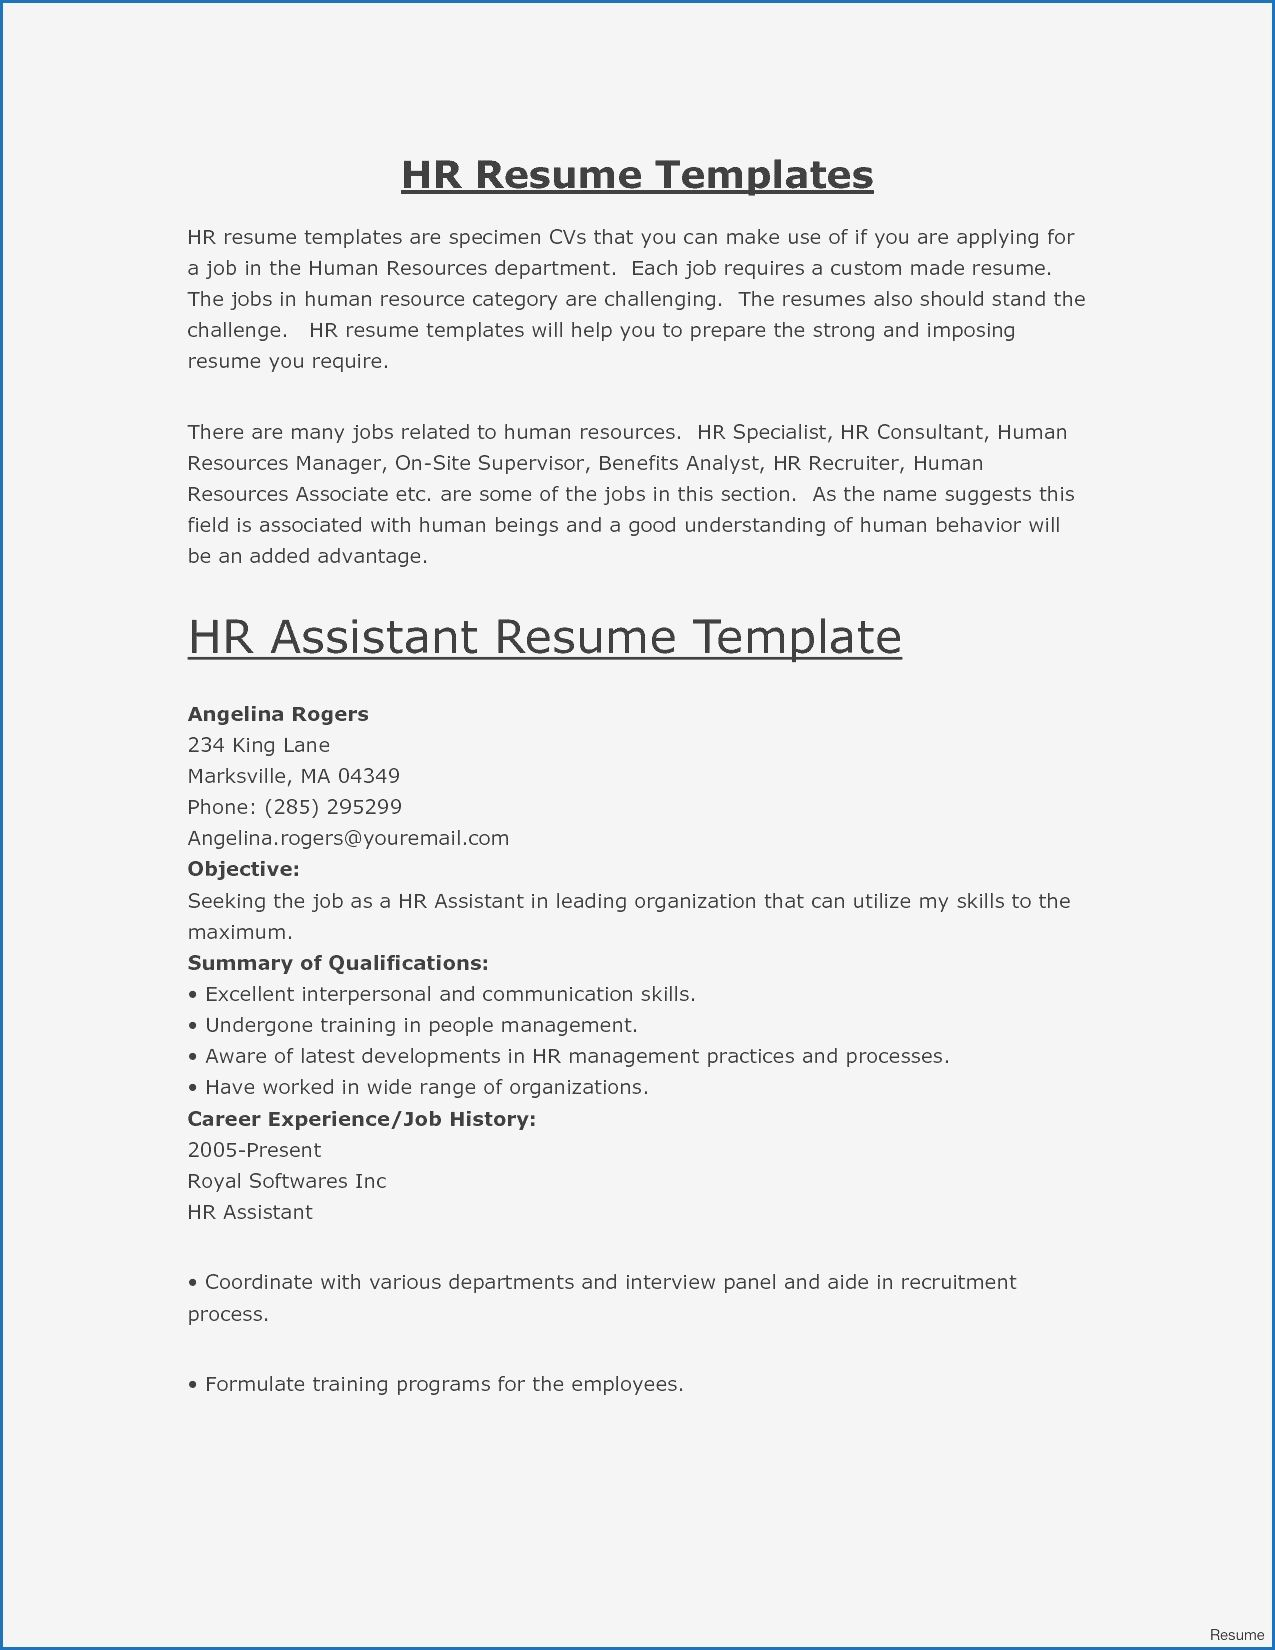 Online Resume Maker For Students